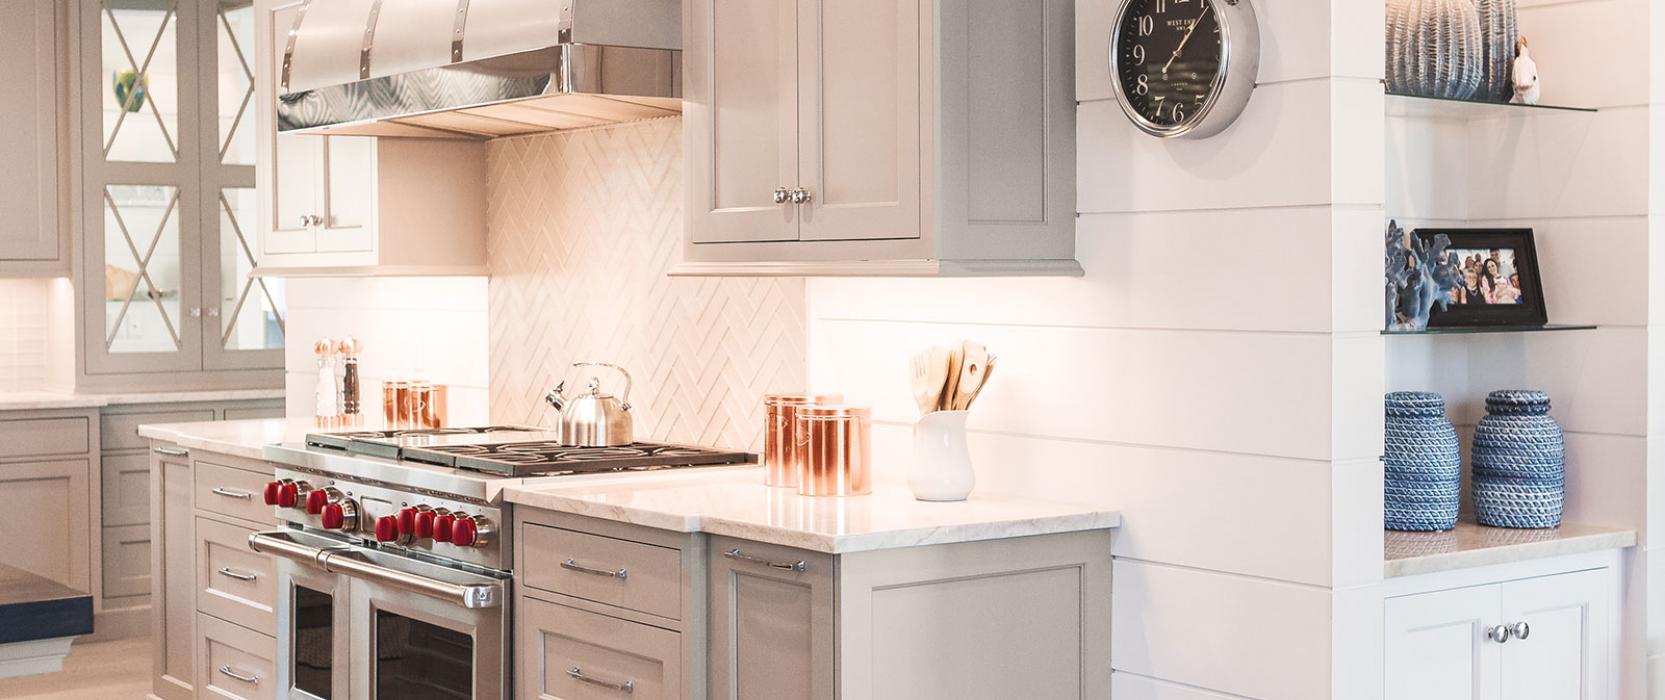 Roomscapes Cabinetry & Design Center 2018 Prism Winner Gold